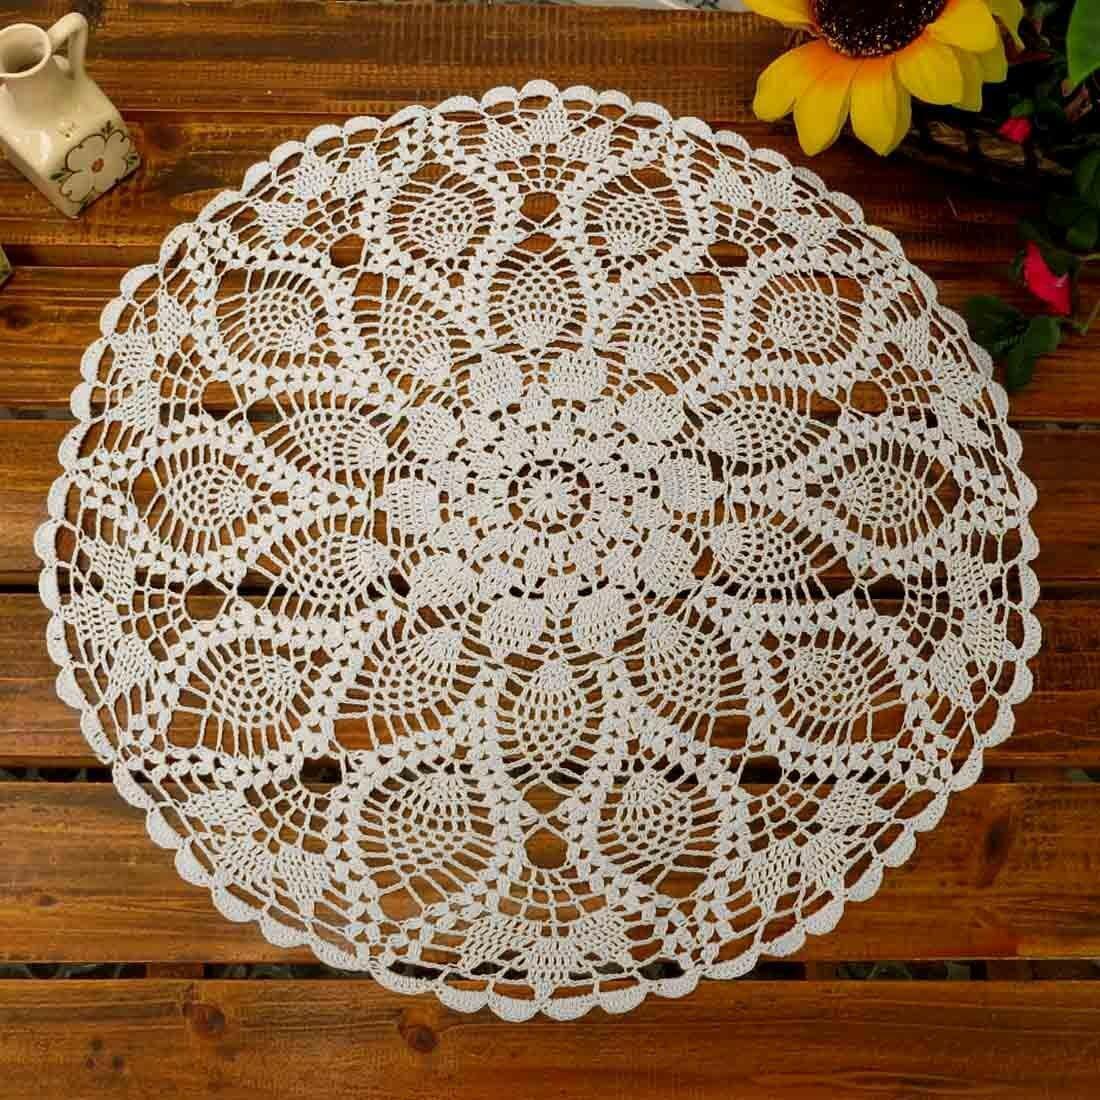 Table Placemats Crochet Doilies Lace Round Cotton Doily For